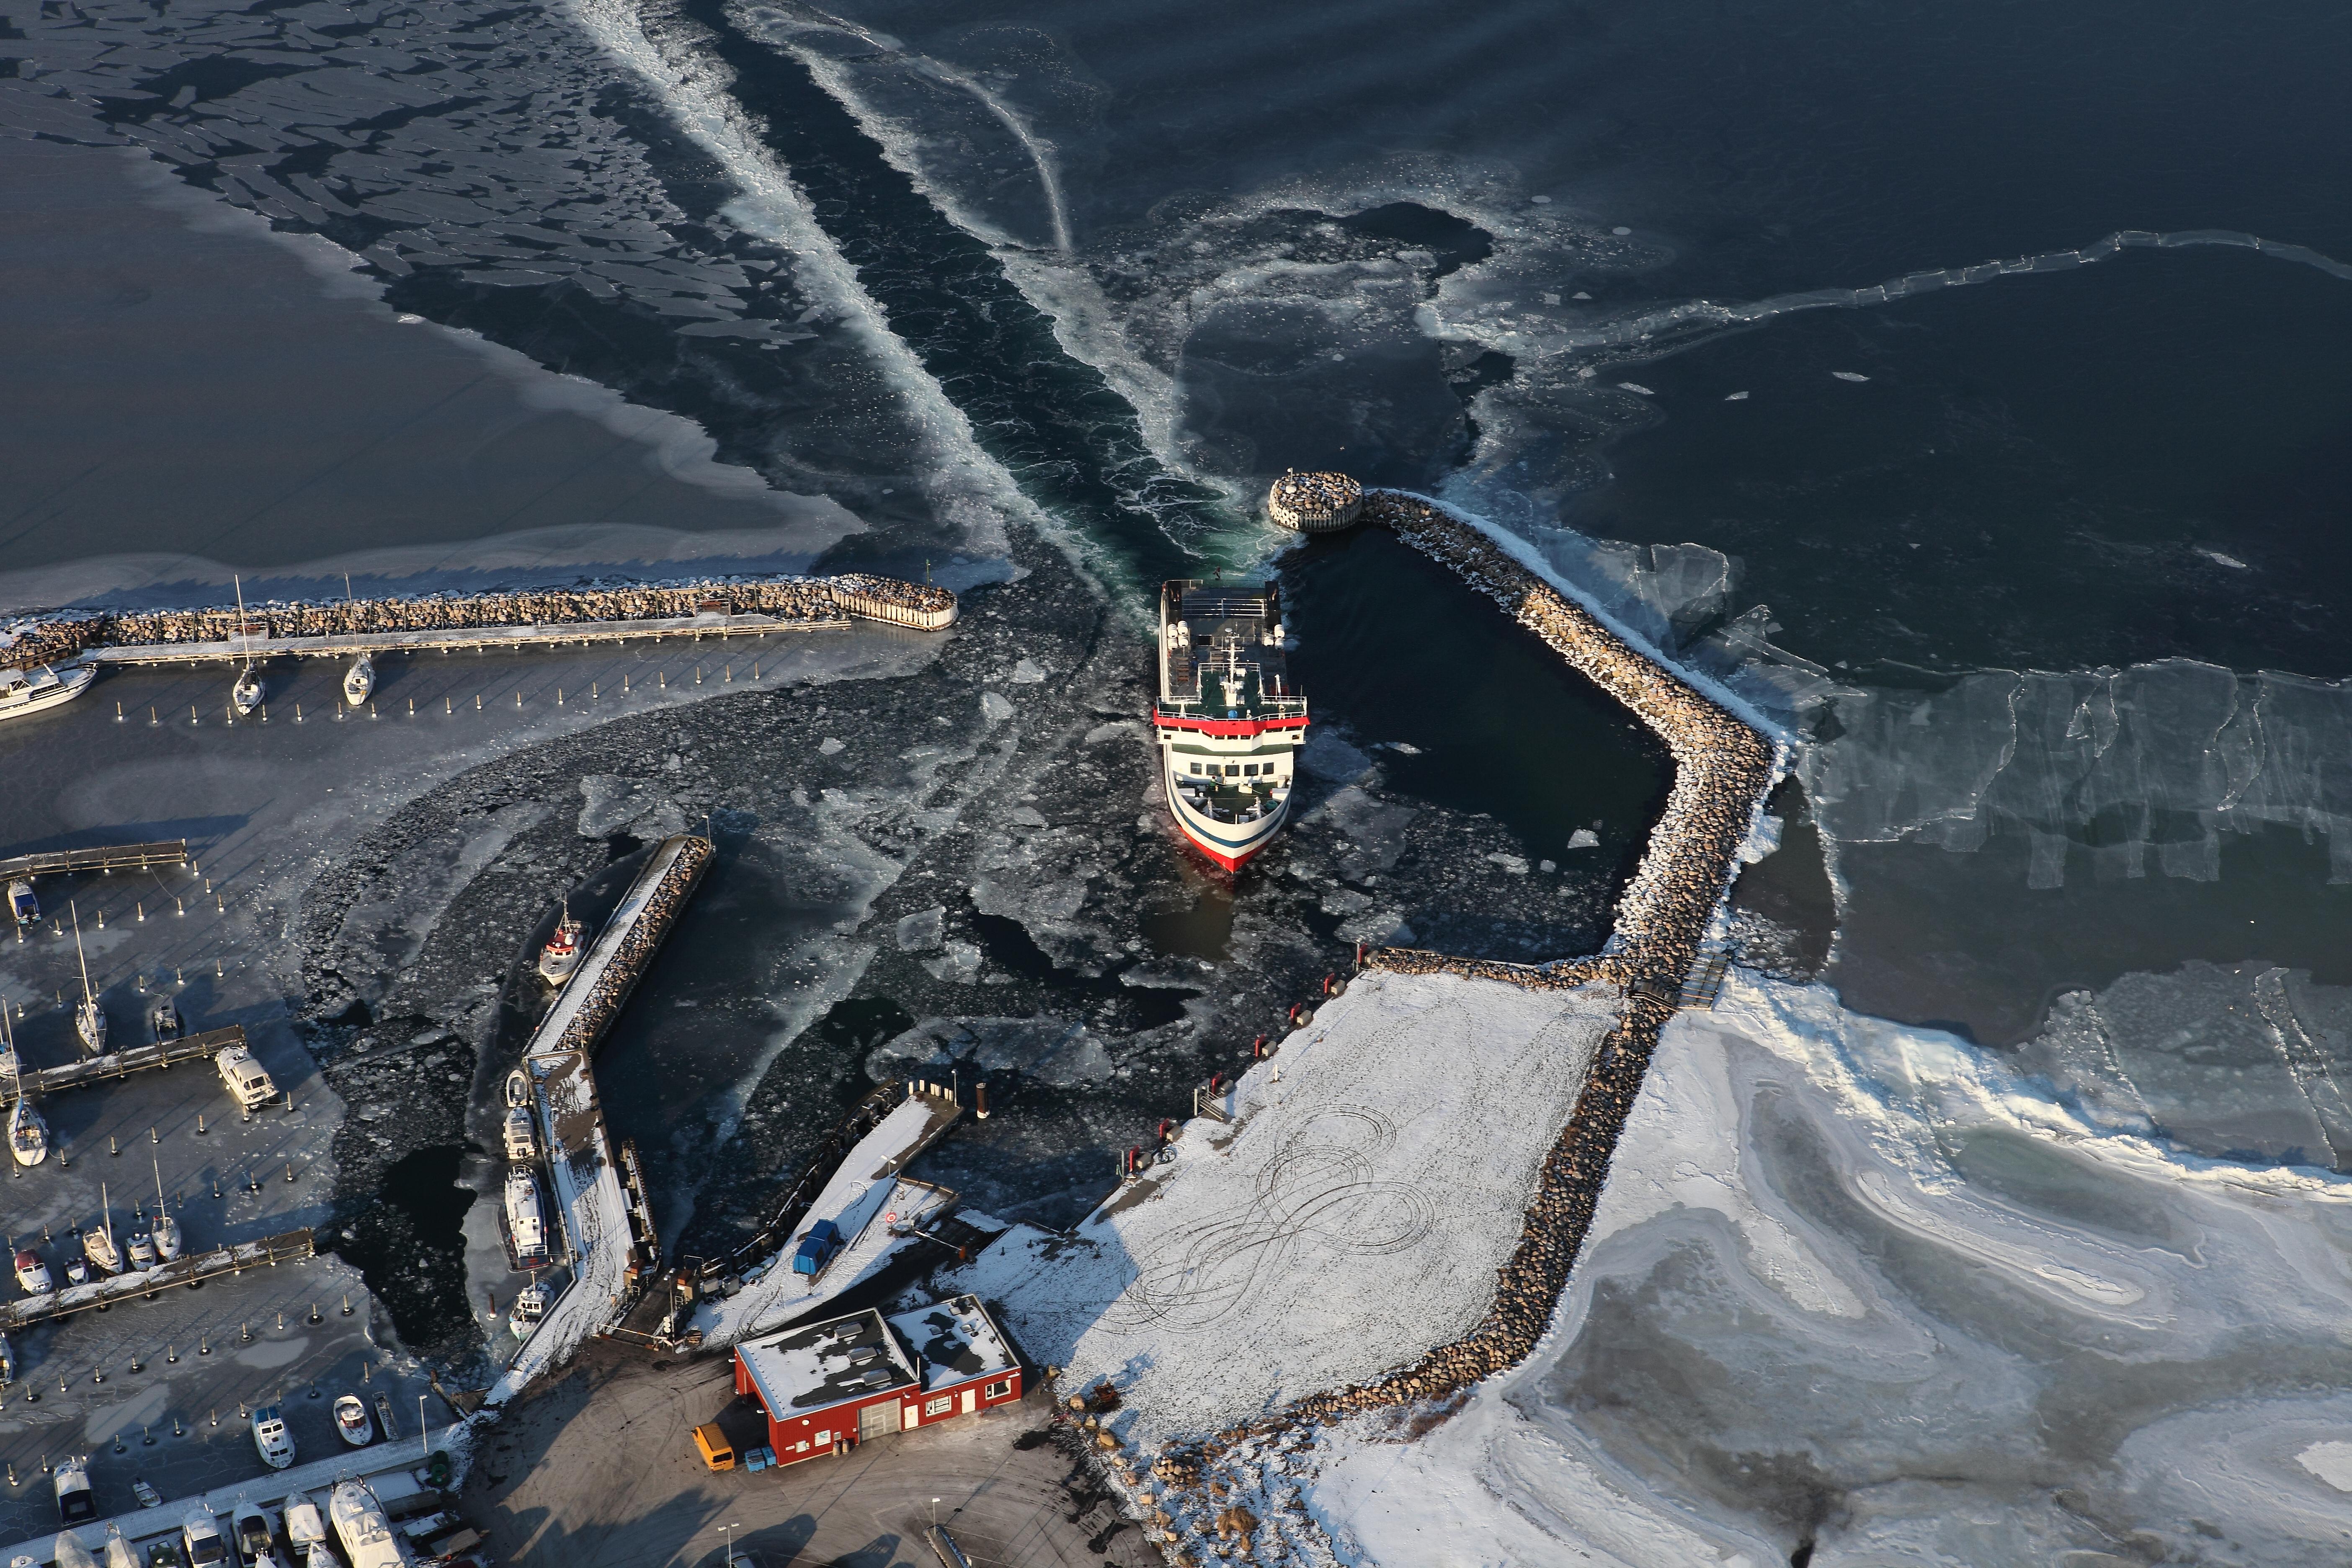 Havnsø Havn - Vinter